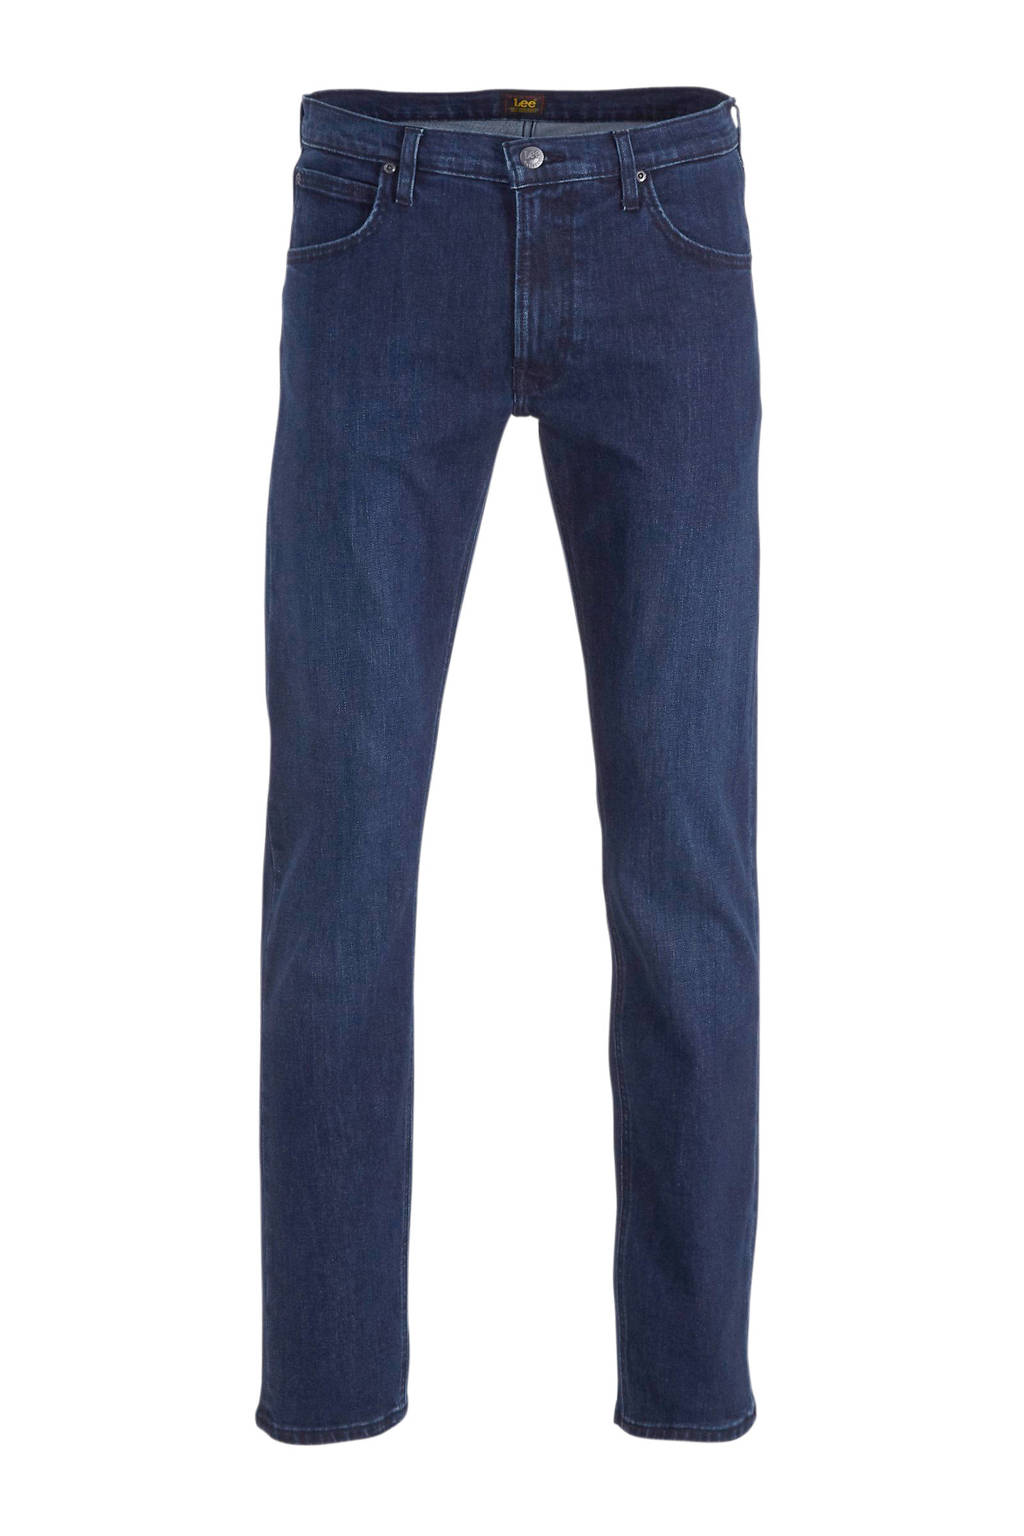 Lee regular fit jeans Daren dark blue wood, Dark Blue Wood